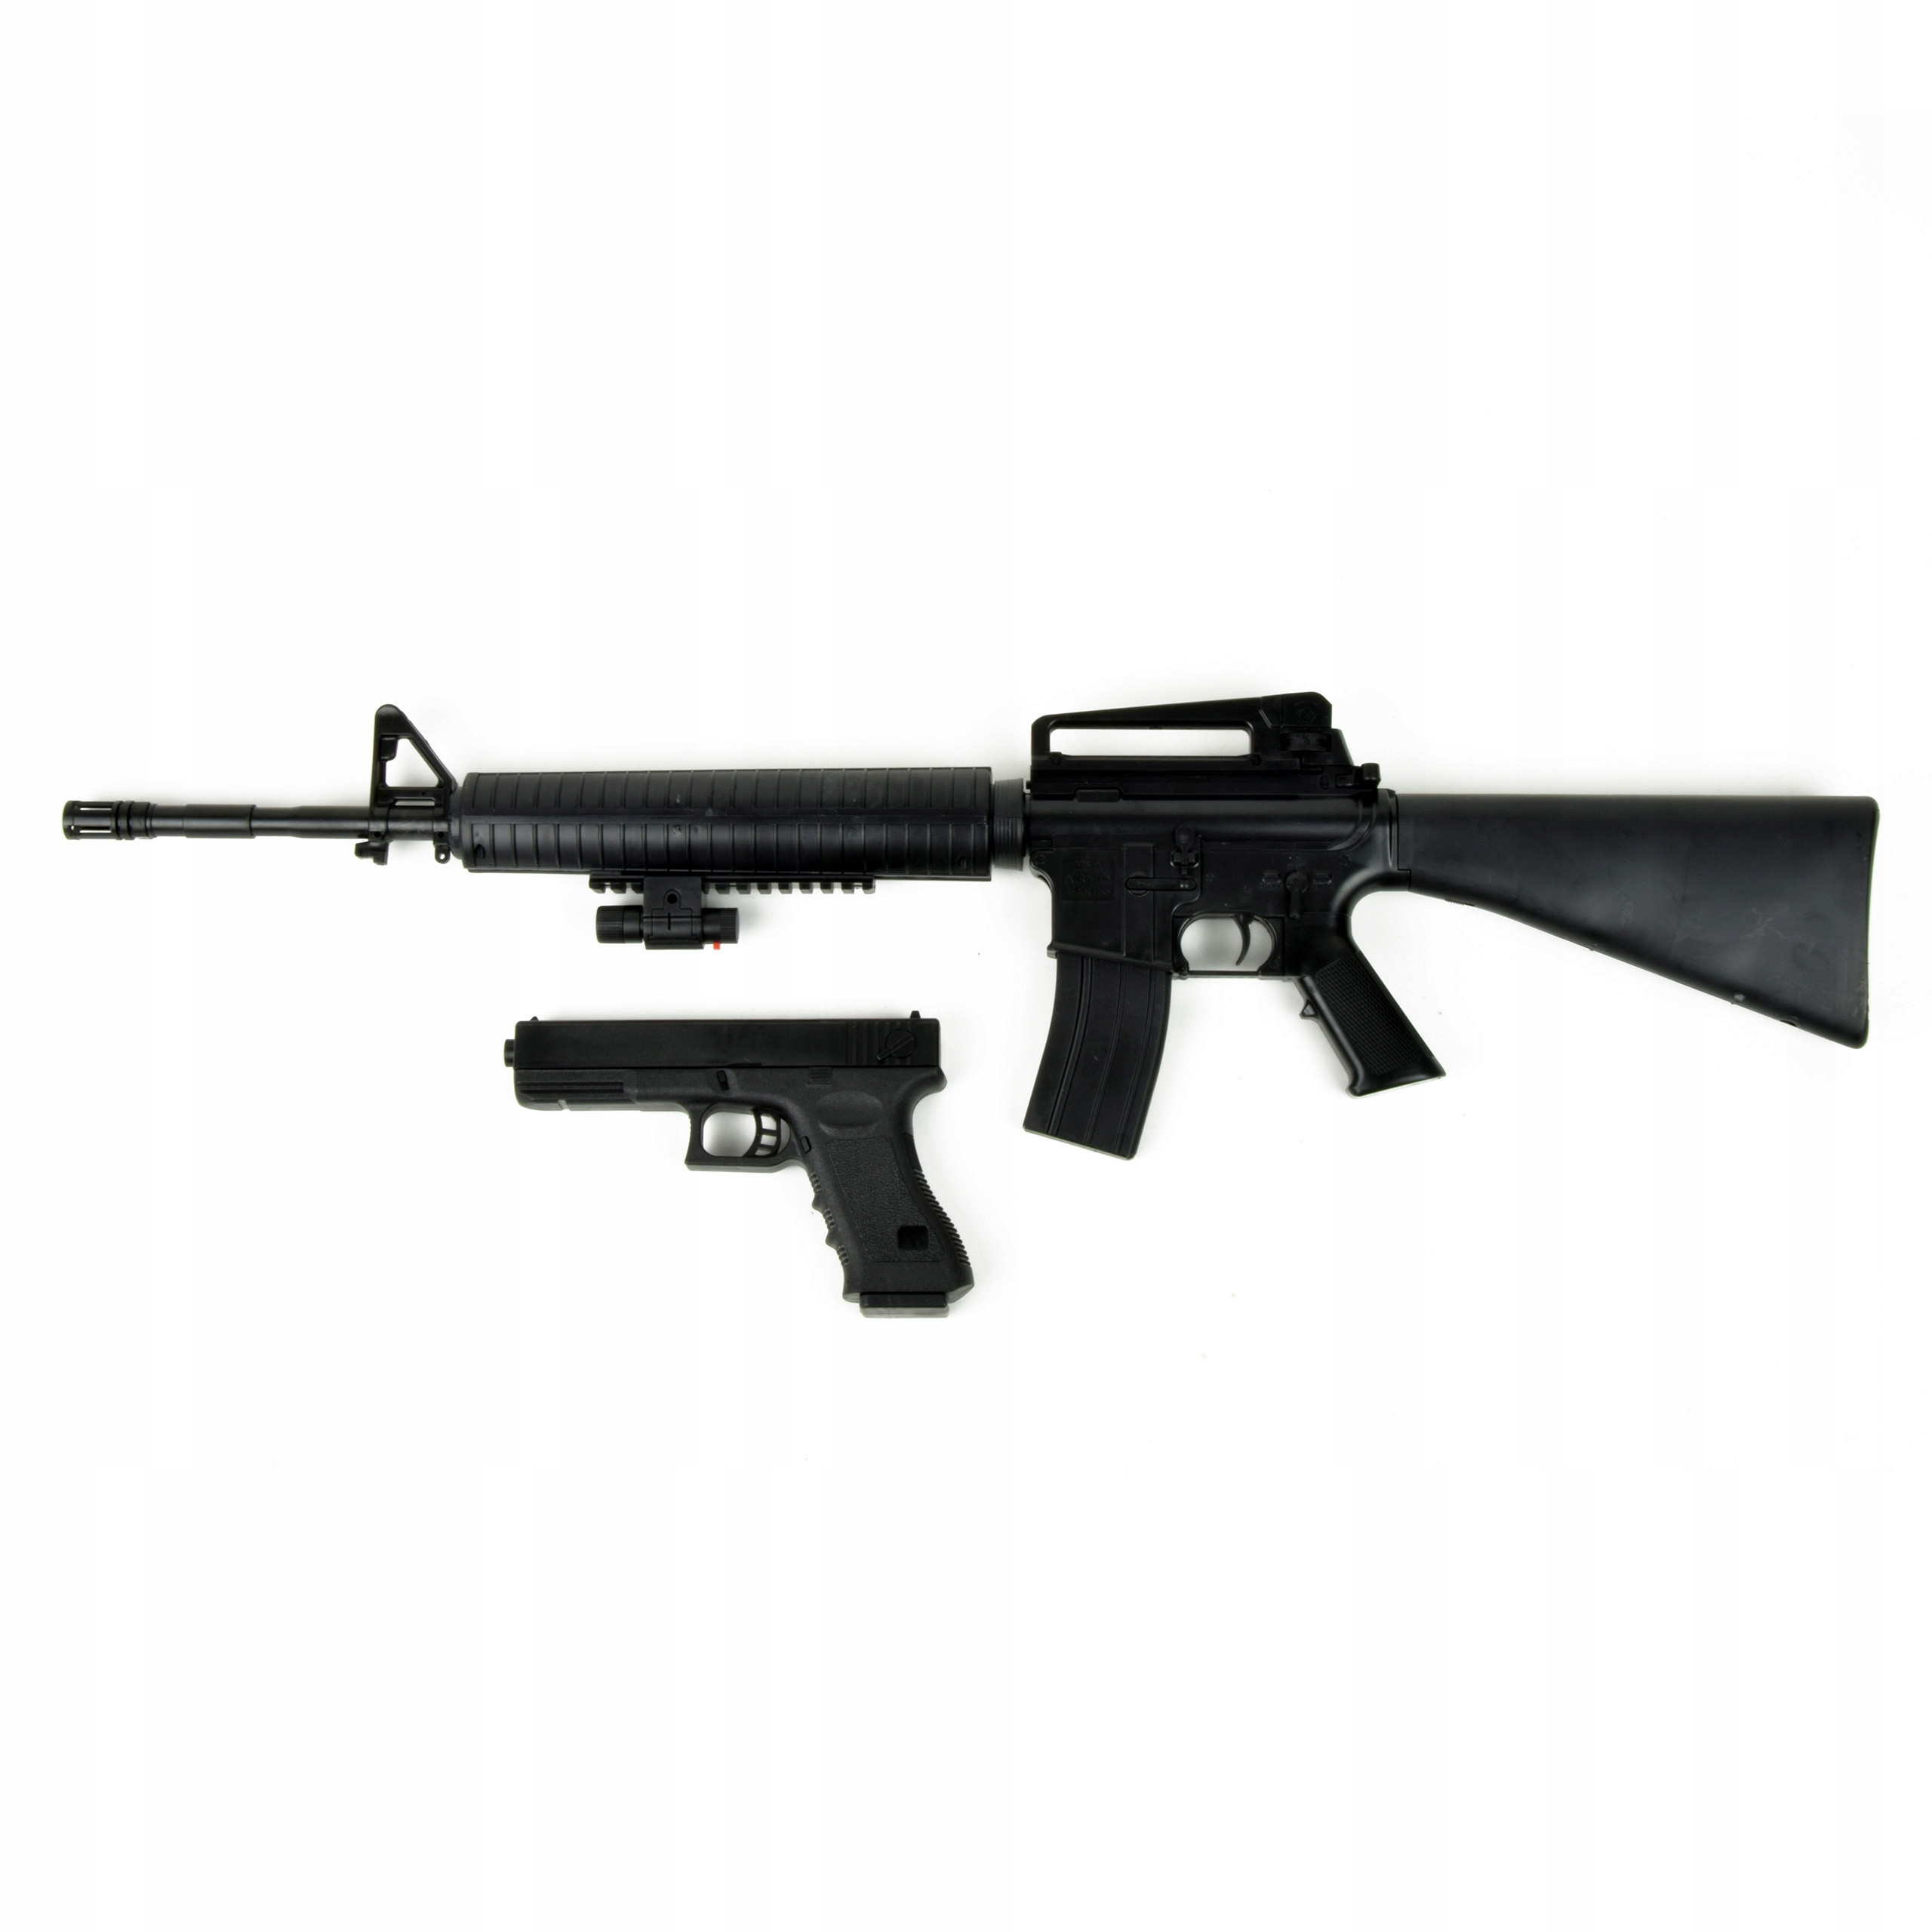 Puška M16 Glock 17 pištoľ 89cm laser BB